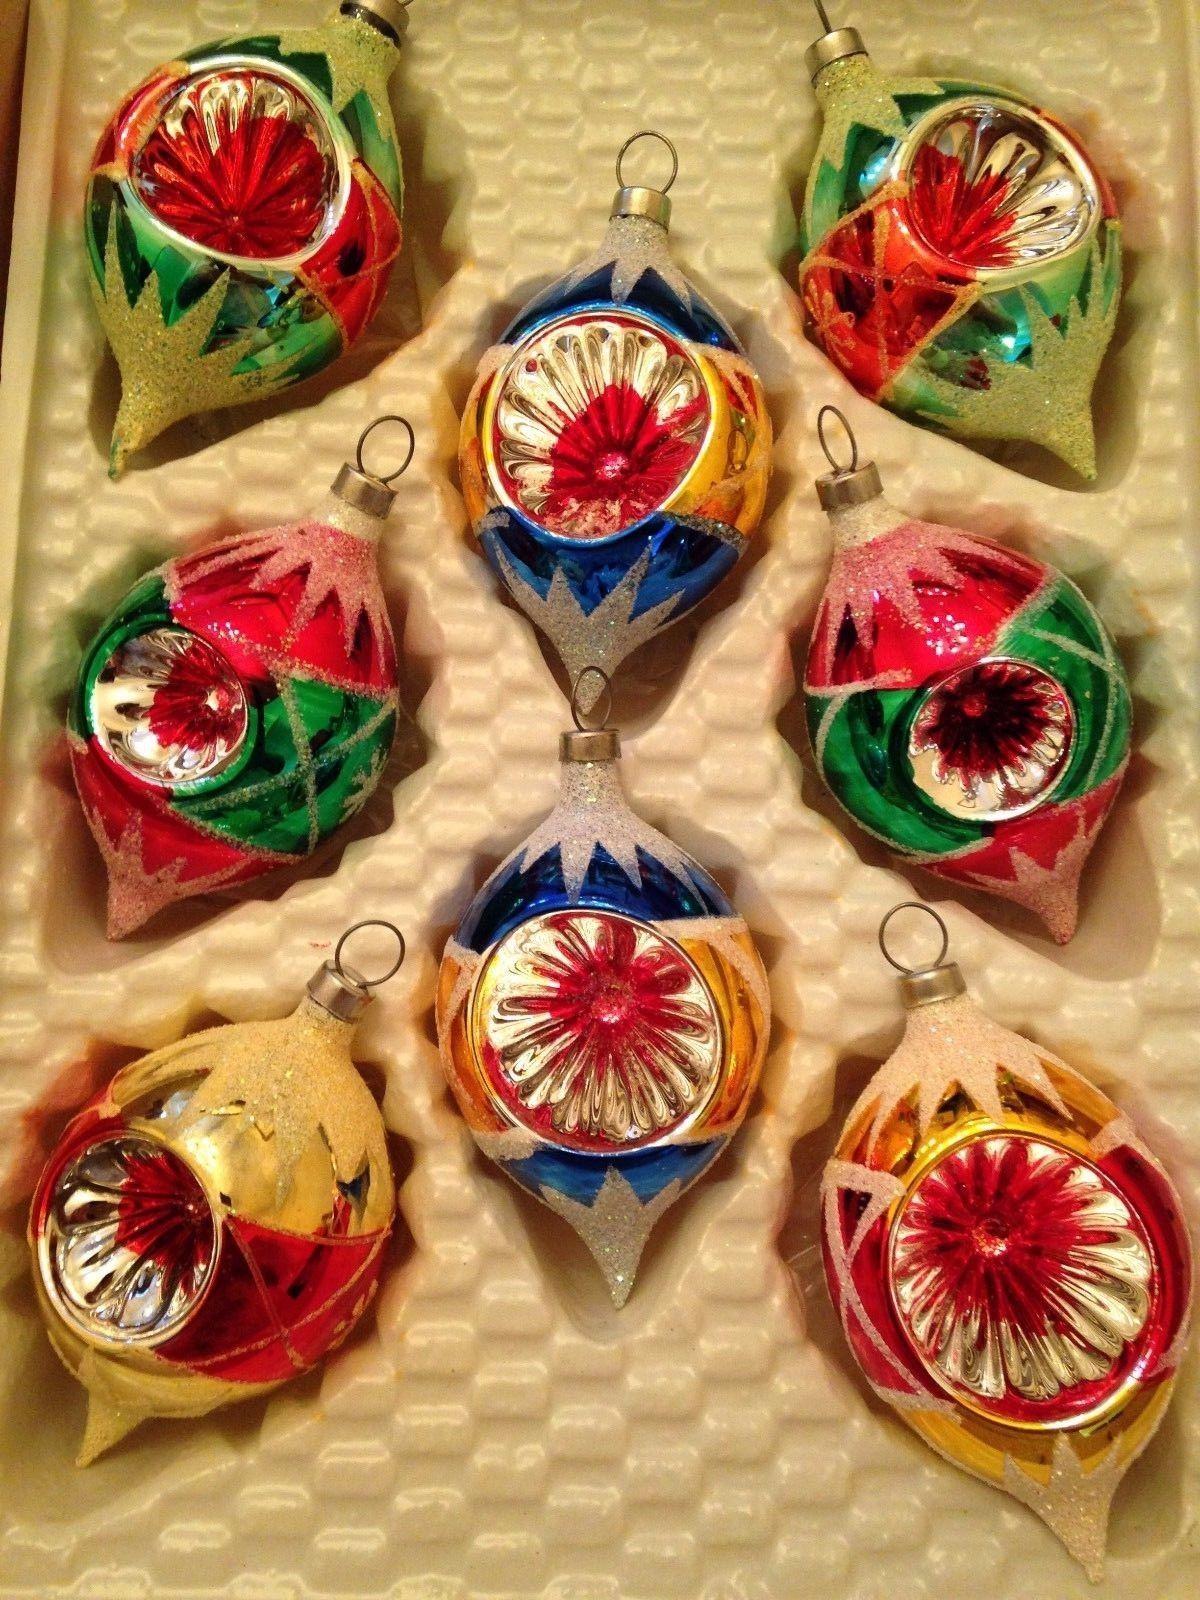 Box 8 Indent Vtg Glass Xmas Teardrop Mica Glitter Reflector Ornaments Antique Christmas Ornaments Vintage Ornaments Christmas Ornaments